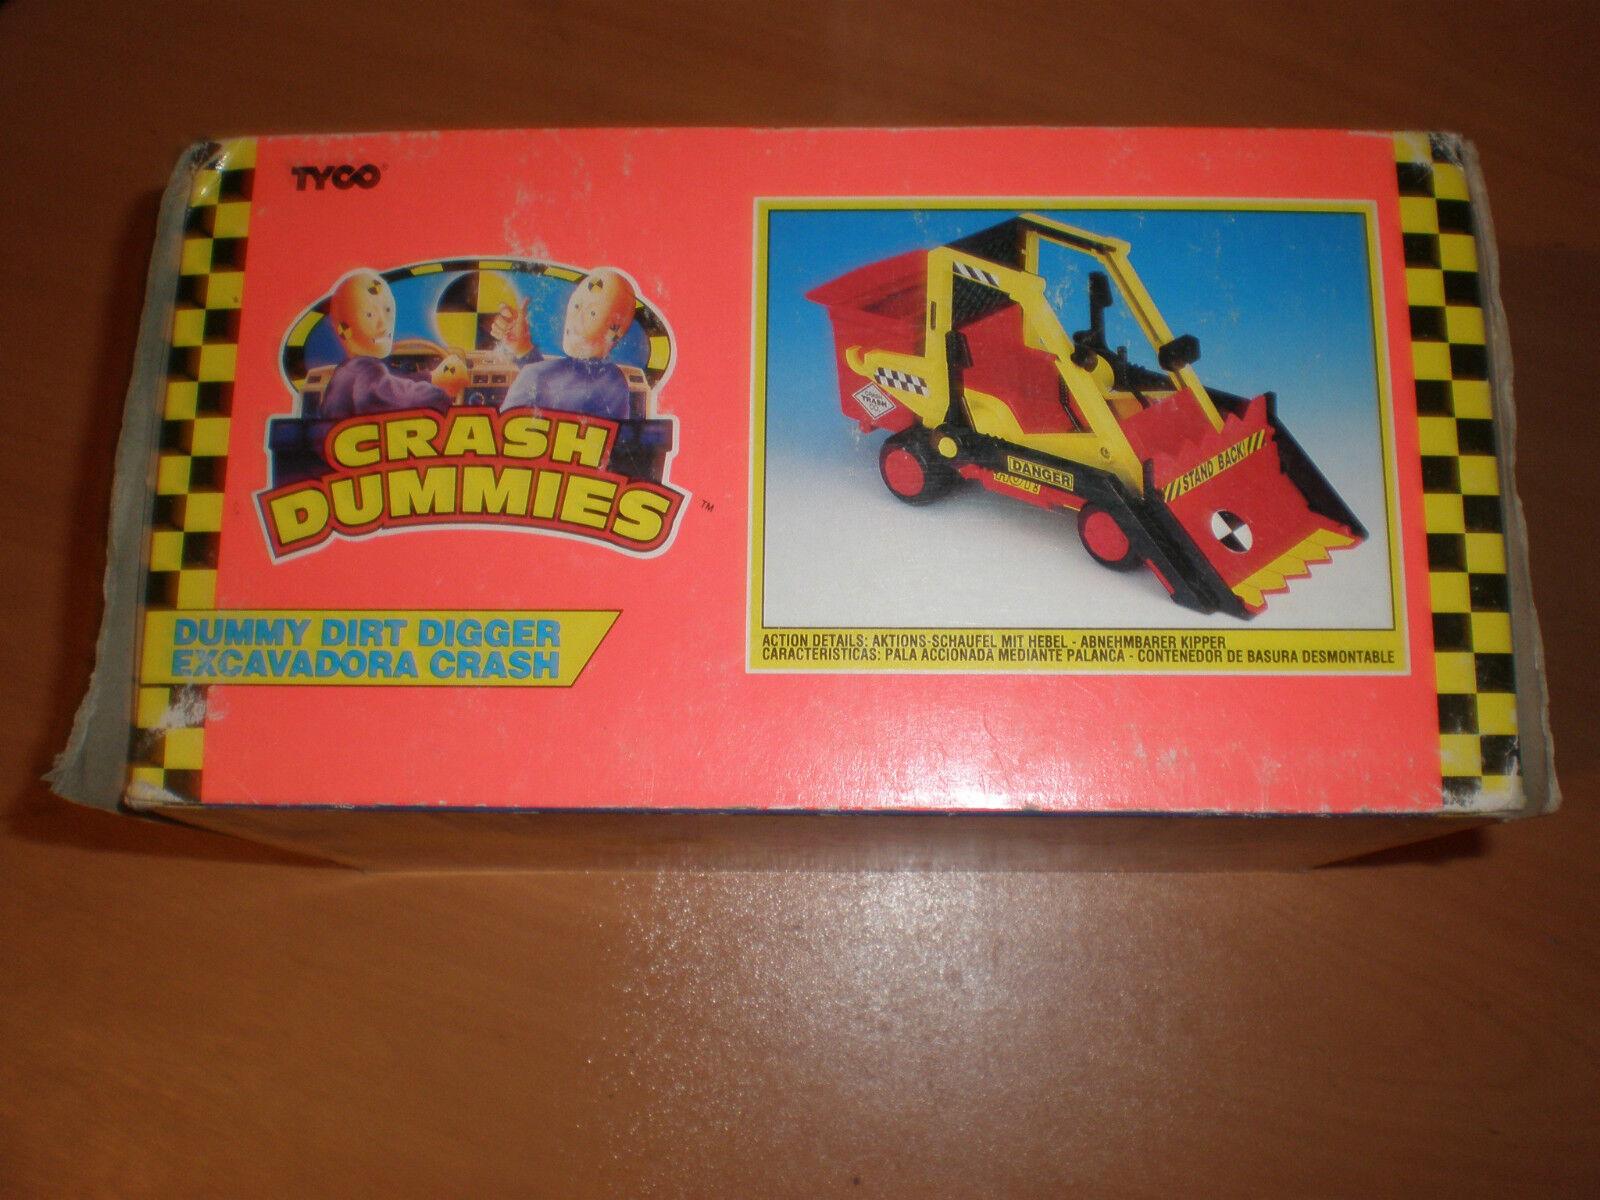 VINTAGE CRASH DUMMIES DUMMY DIRT DIGGER MIB MINT TYCO TYCO TYCO 1992 a3c2d1